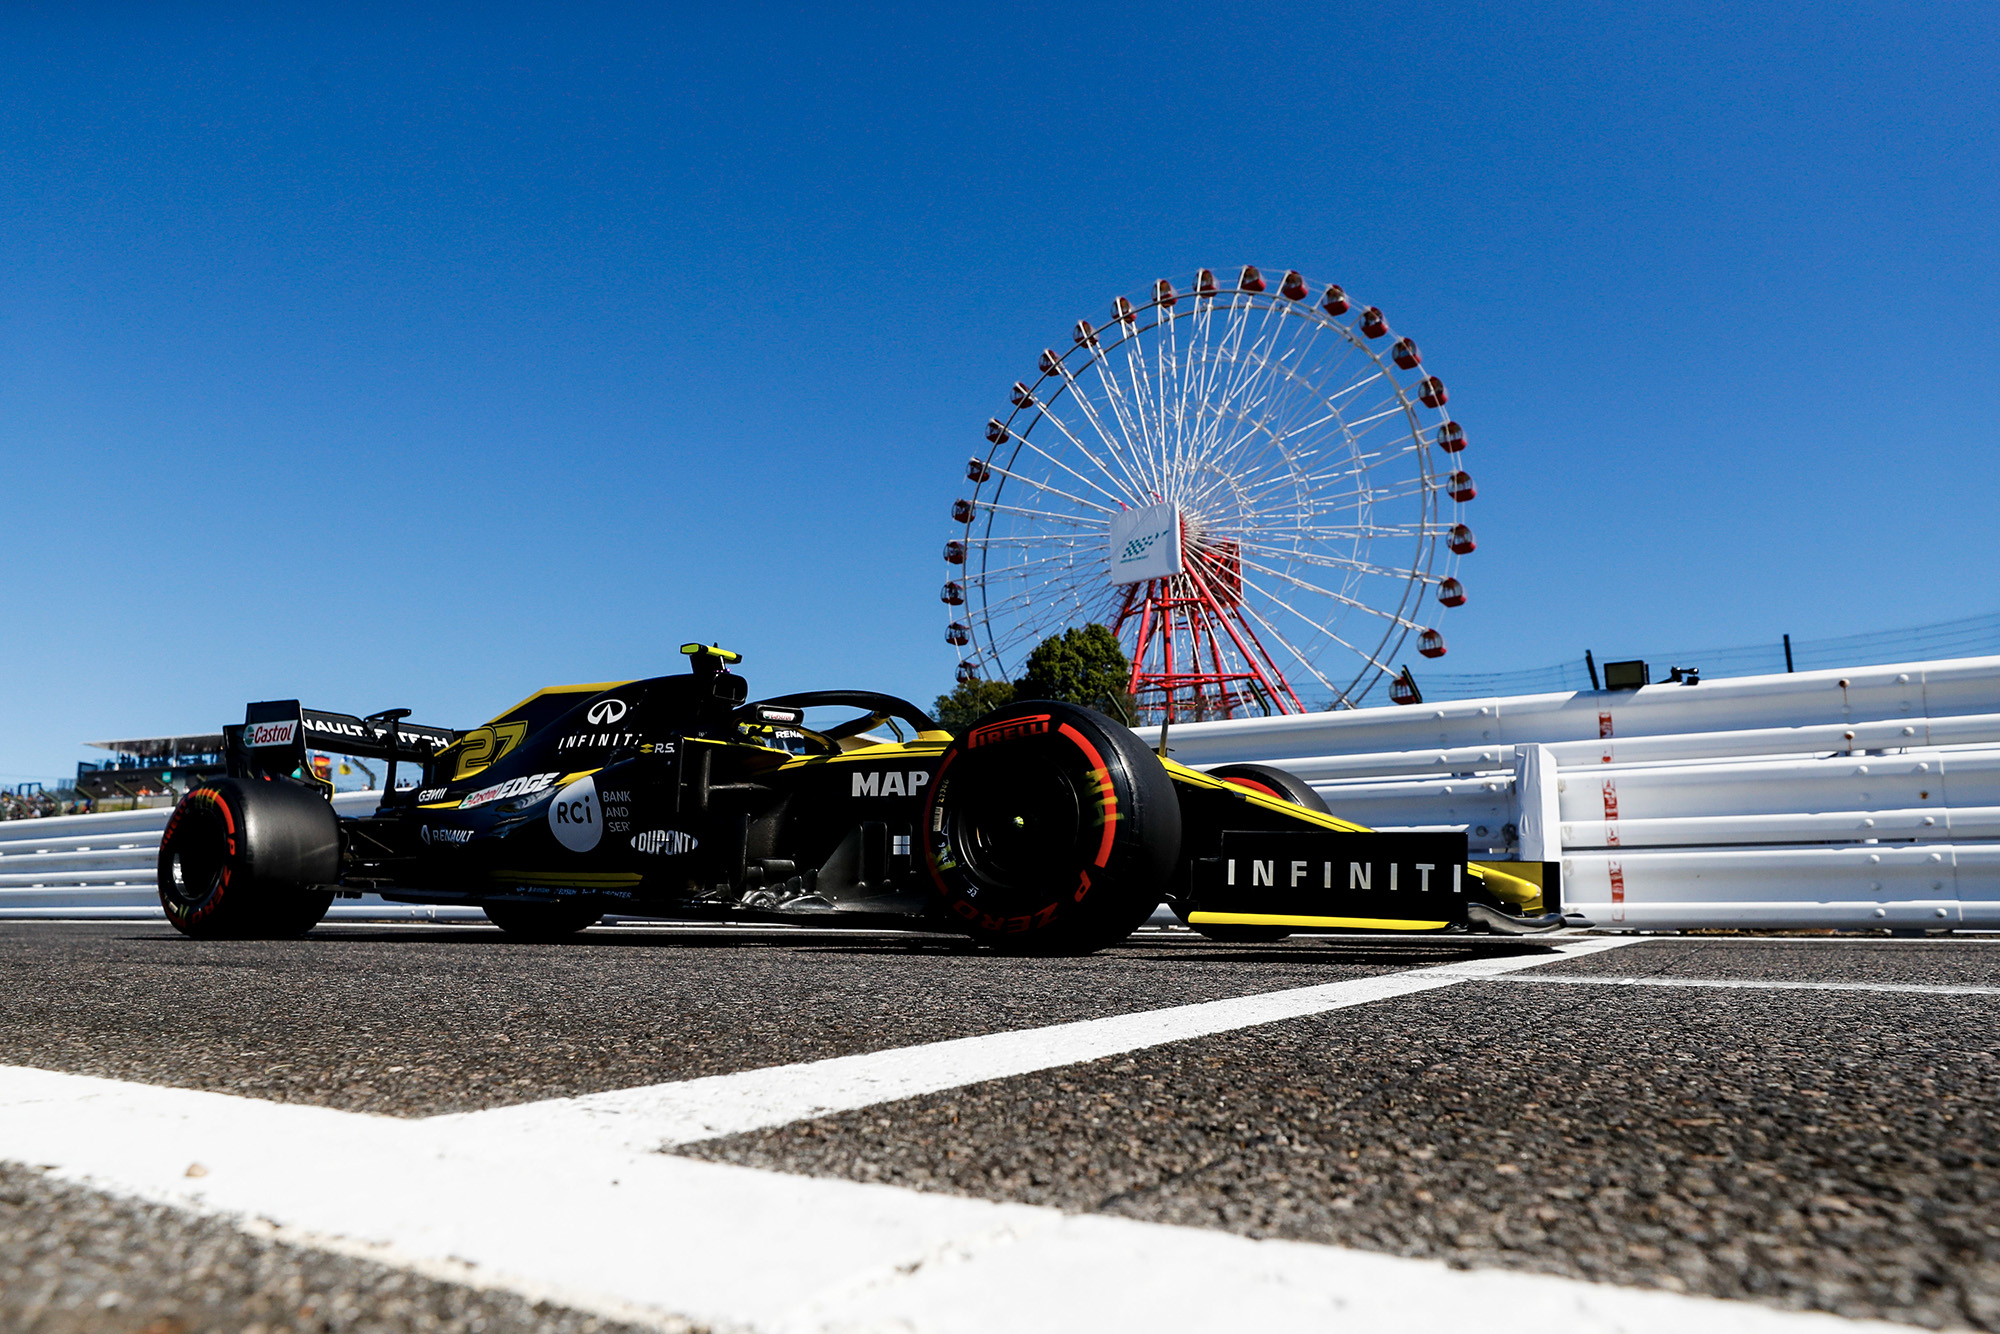 Nico Hulkenberg's Renault in front of Suzuka's big wheel at the 2019 Japanese Grand Prix